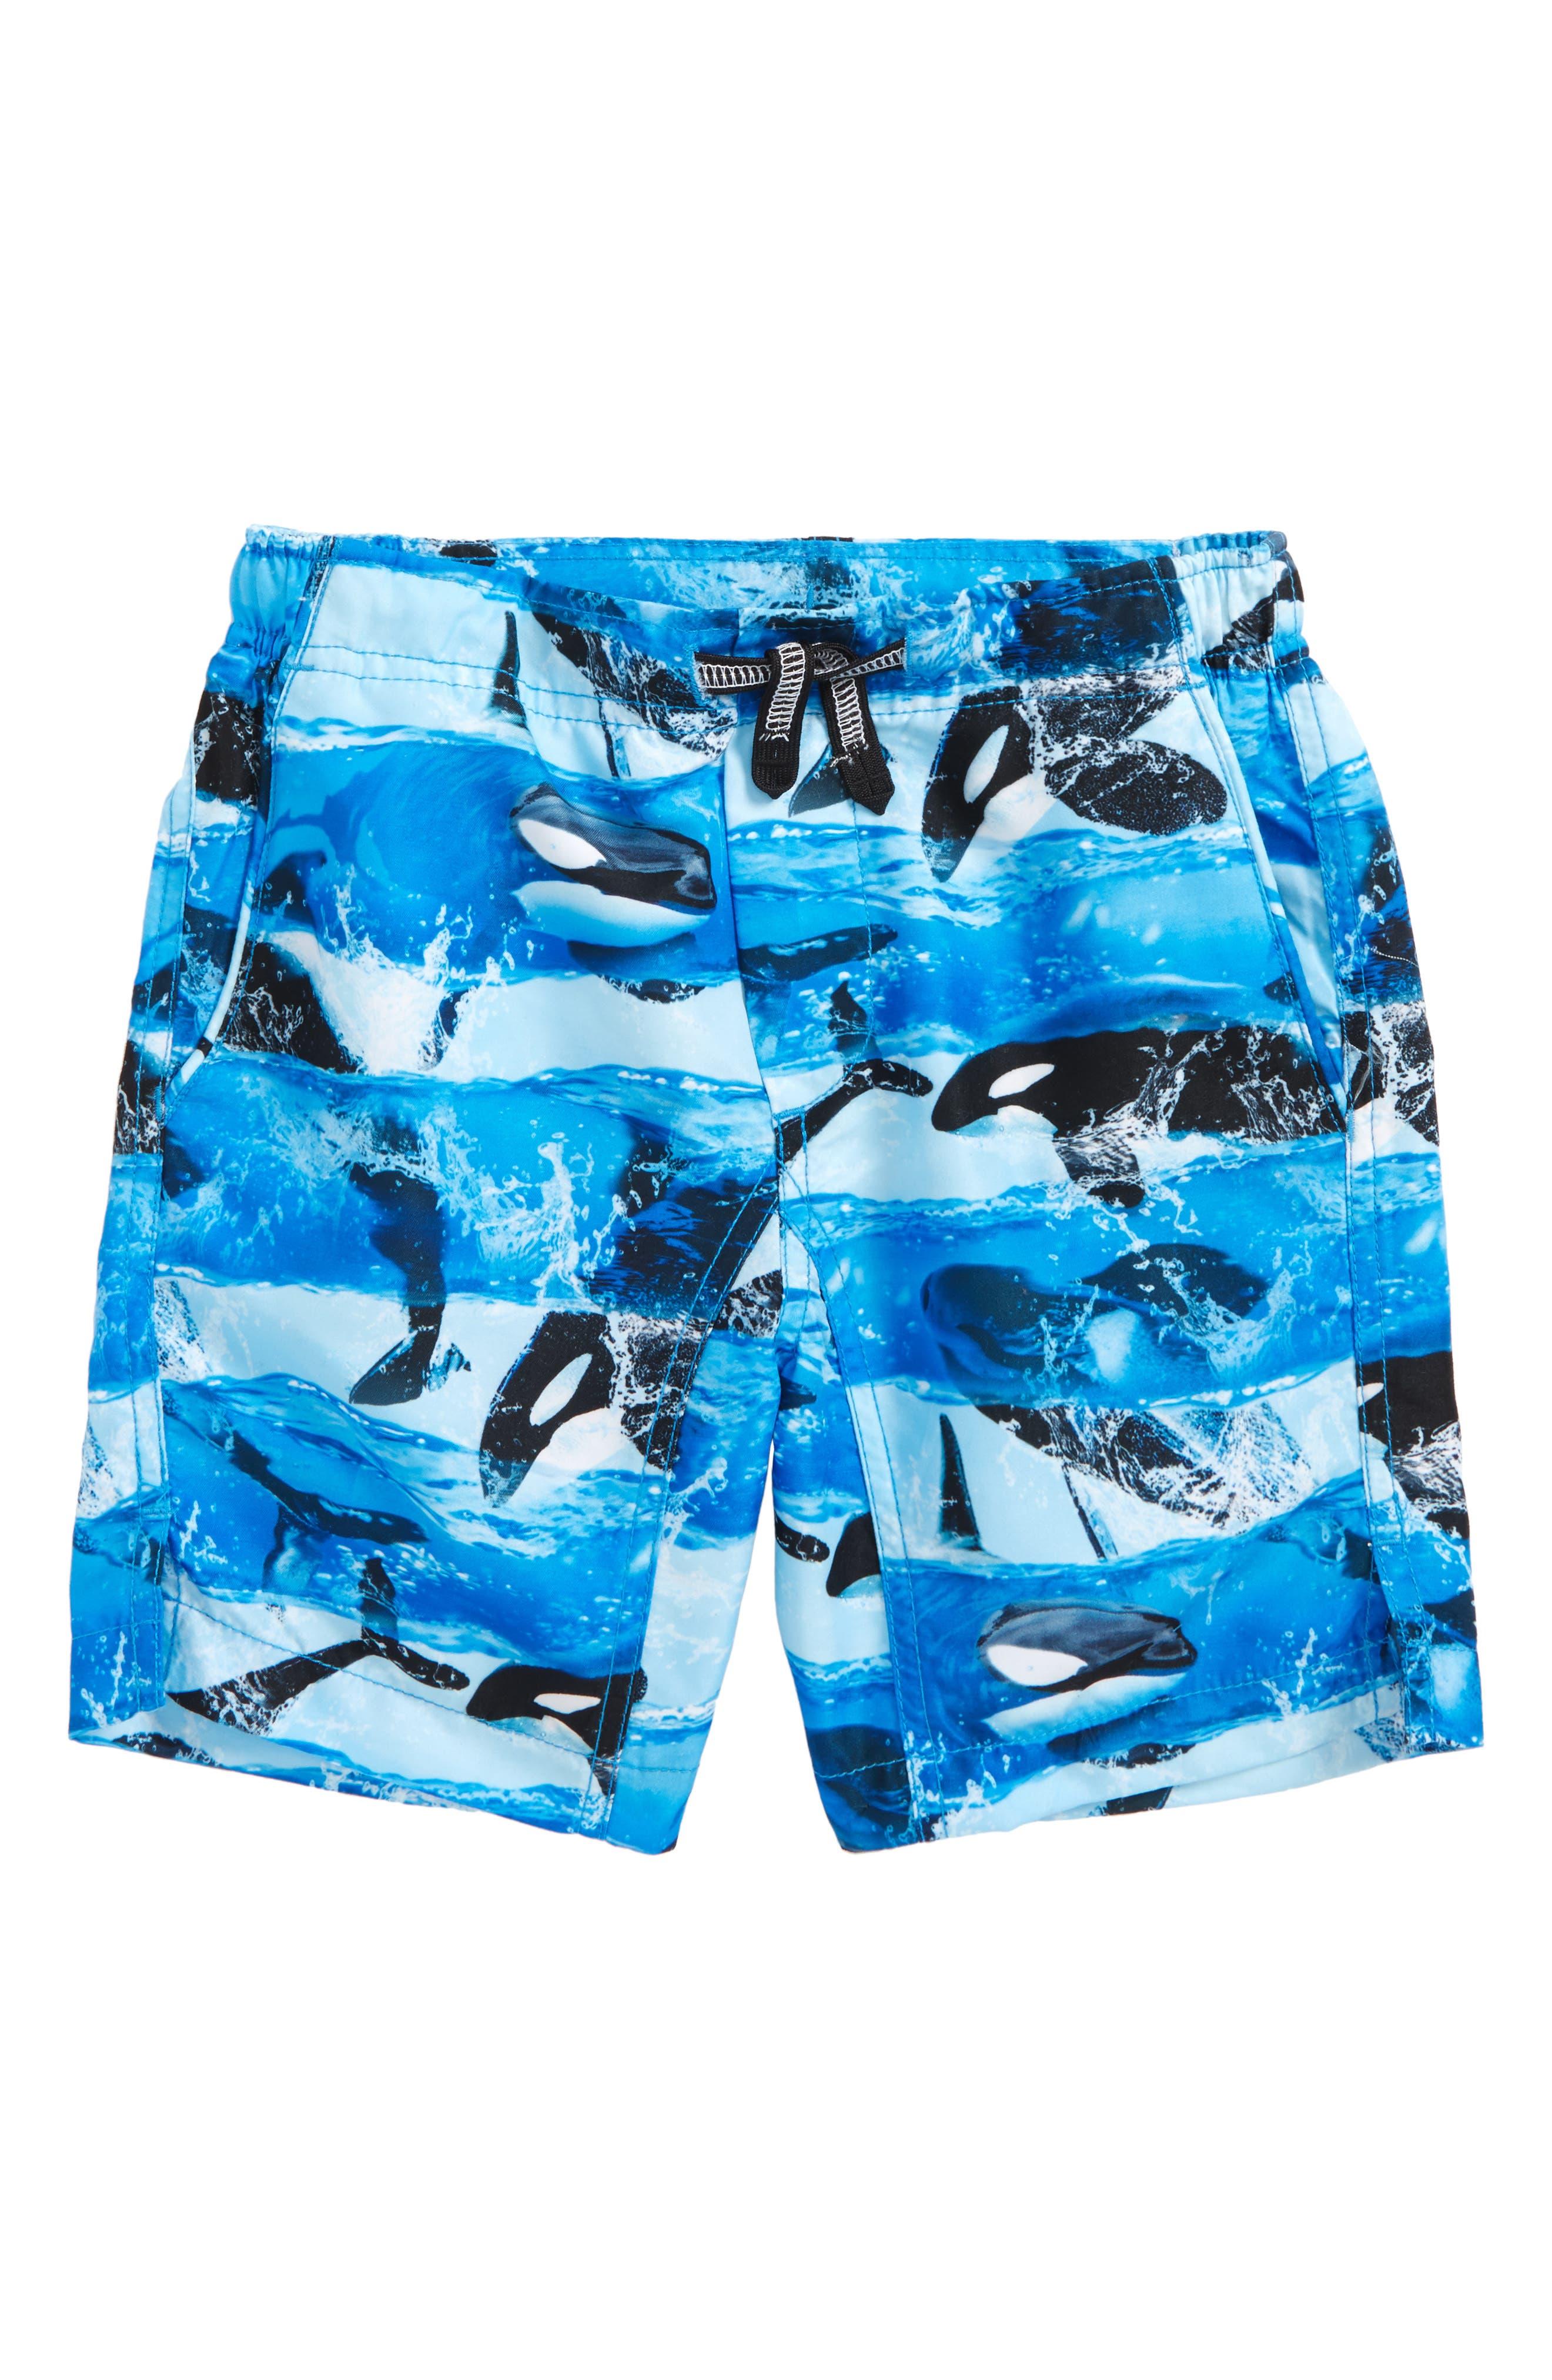 Nario Swim Trunks,                         Main,                         color, Killer Whale